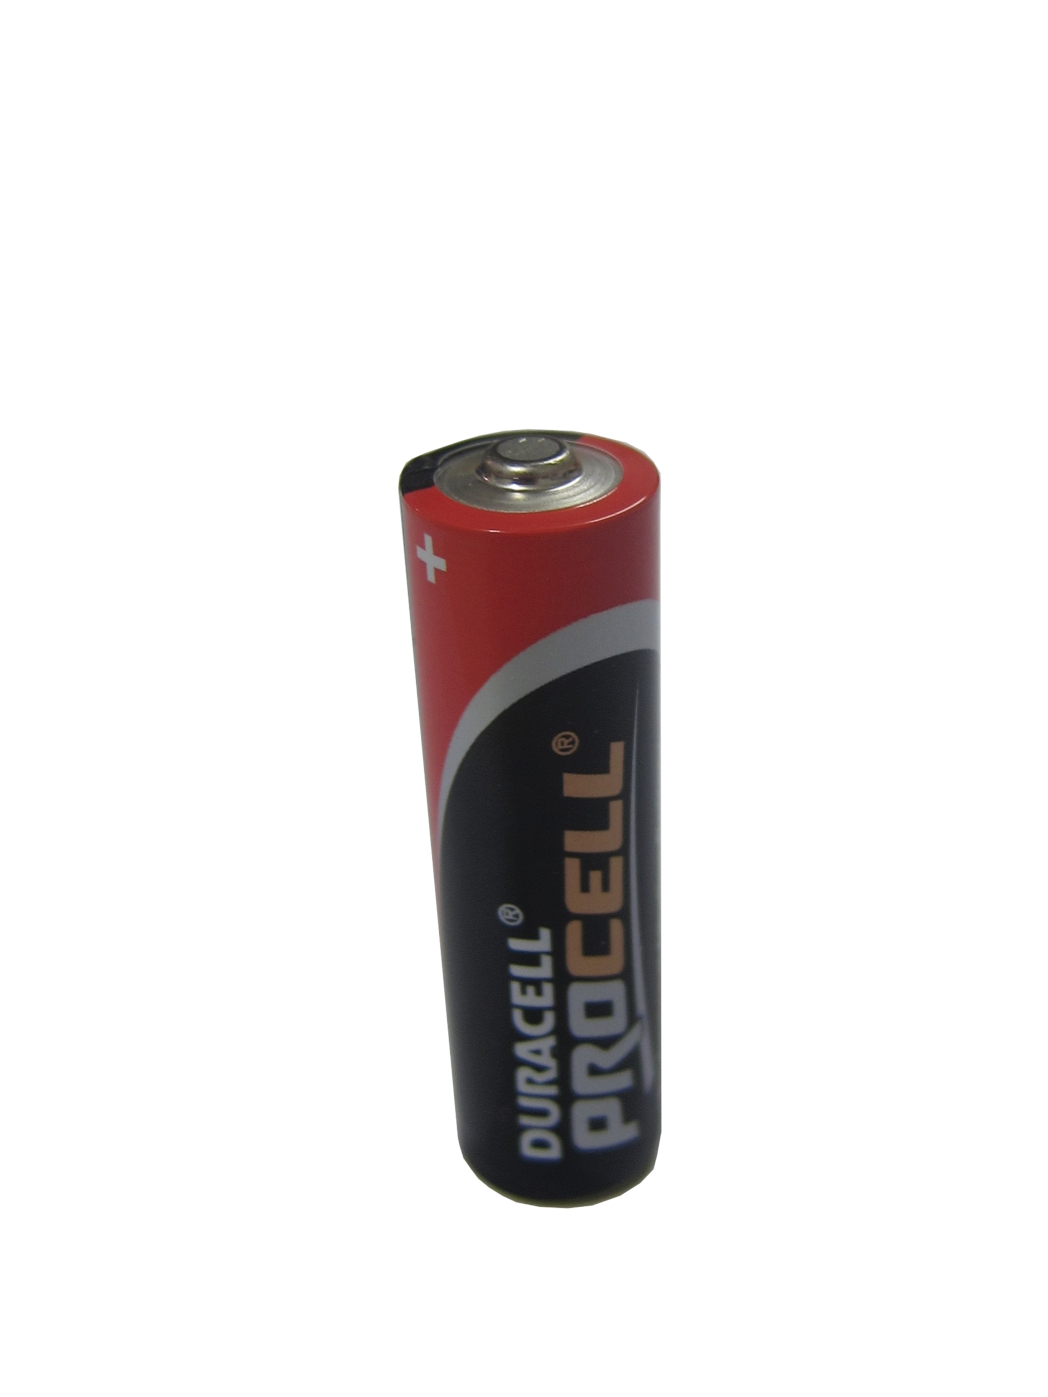 G2 Batterie (Alkaline) AA-Cell (1)